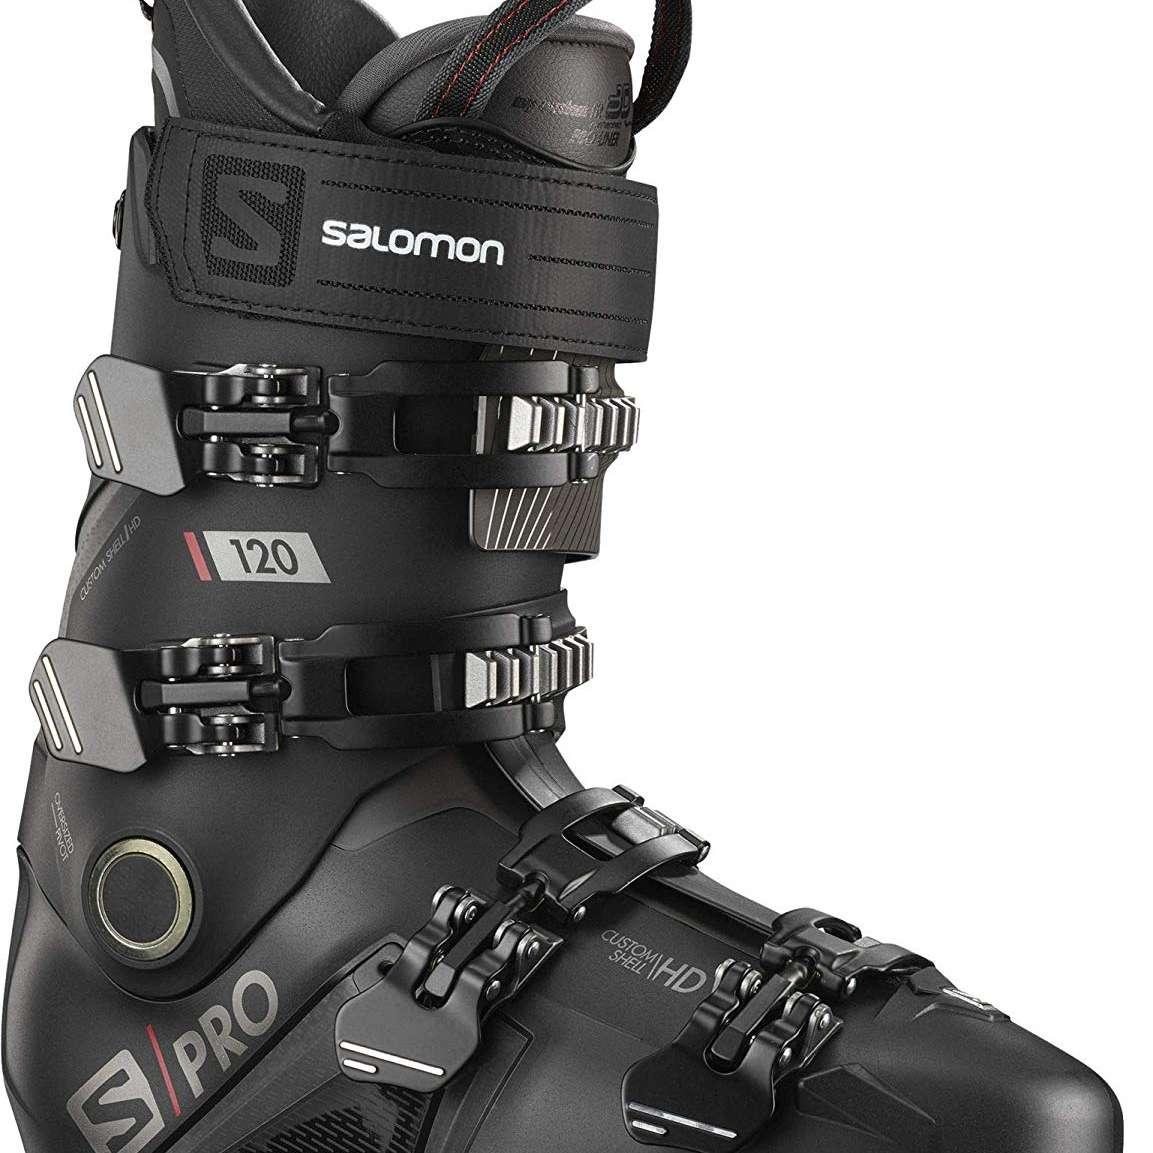 Salomon S / Pro 120